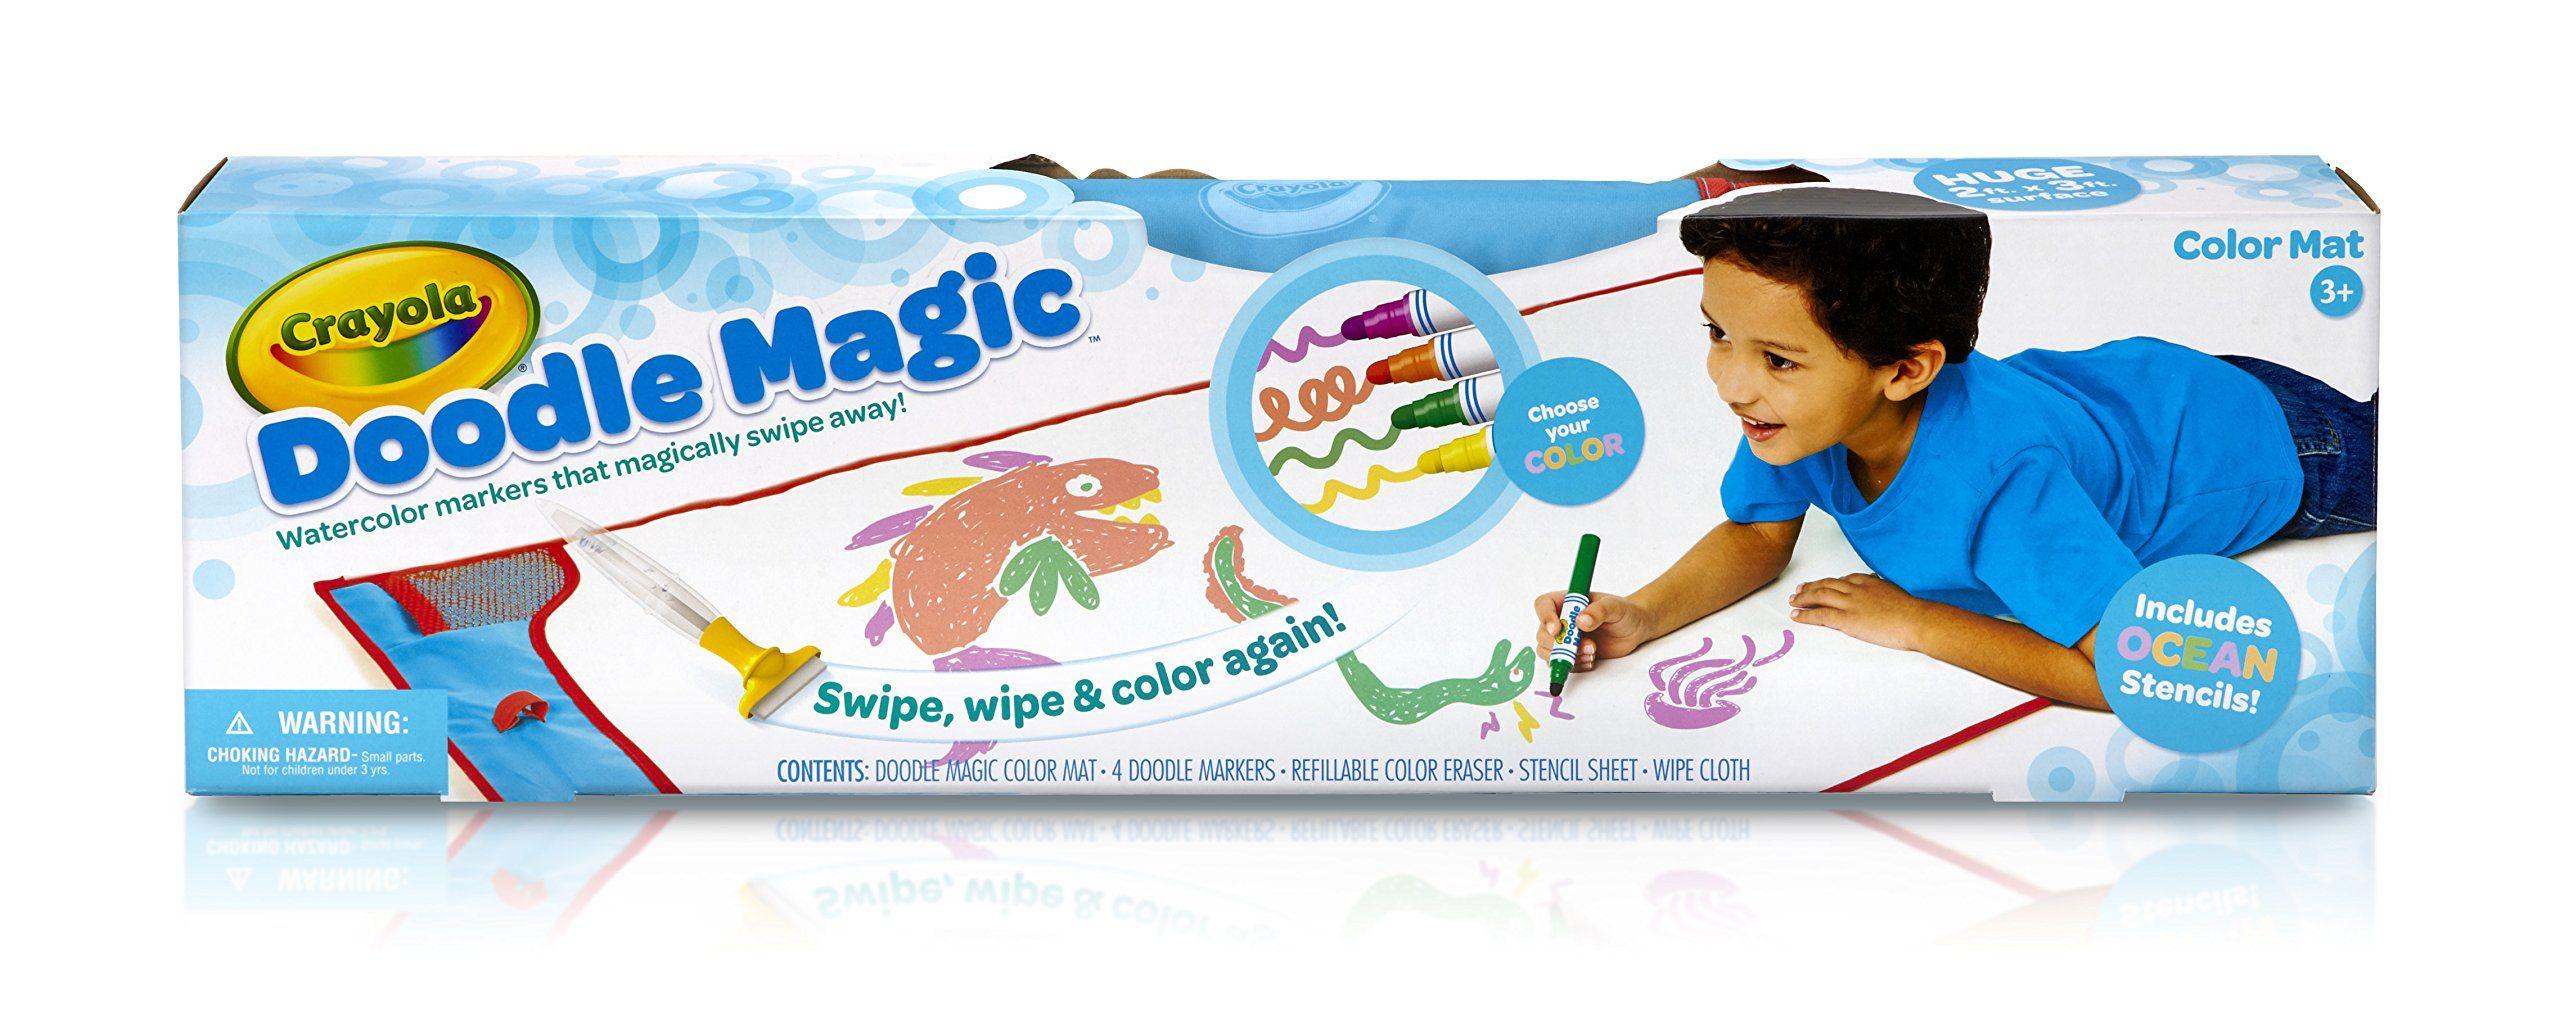 Crayola MatOcean Doodle Magic Color Marker Coloring